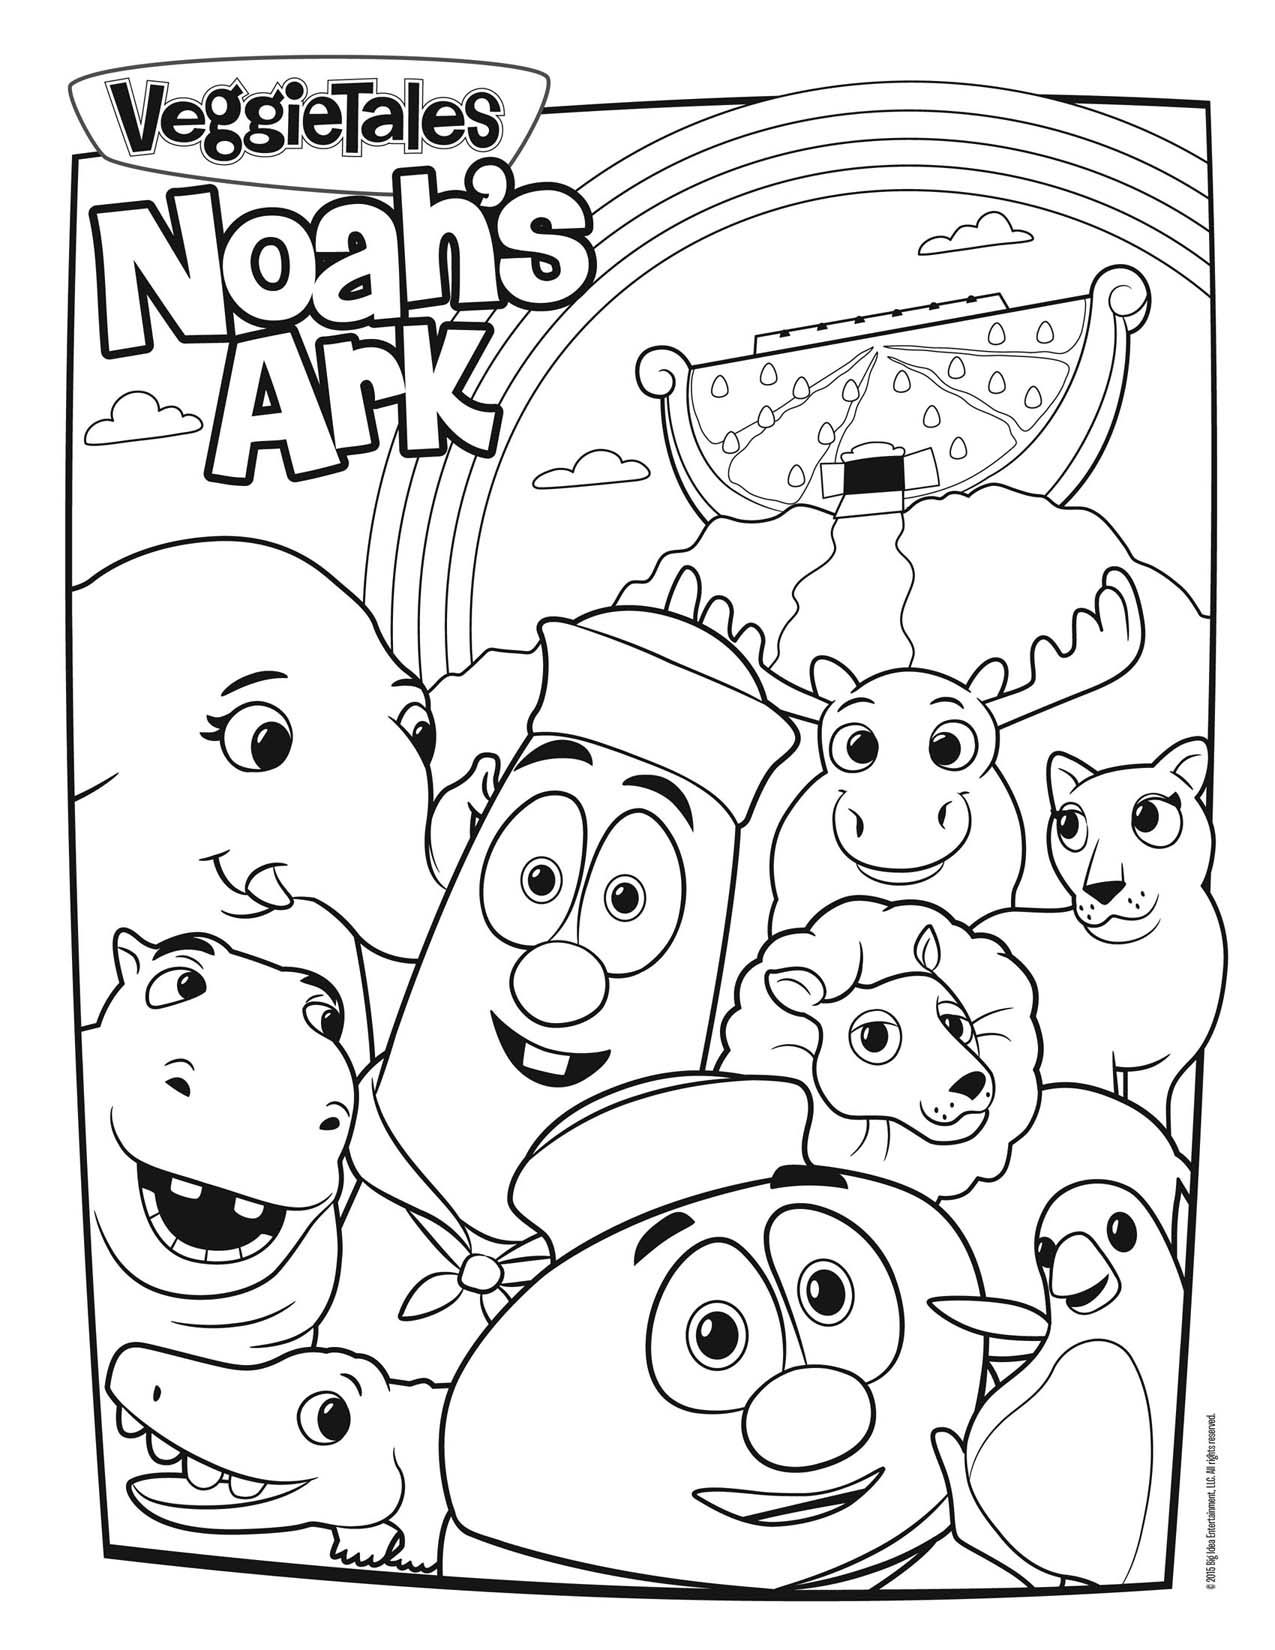 Coloring pages christian preschool - Veggietales Noah S Ark Coloring Page